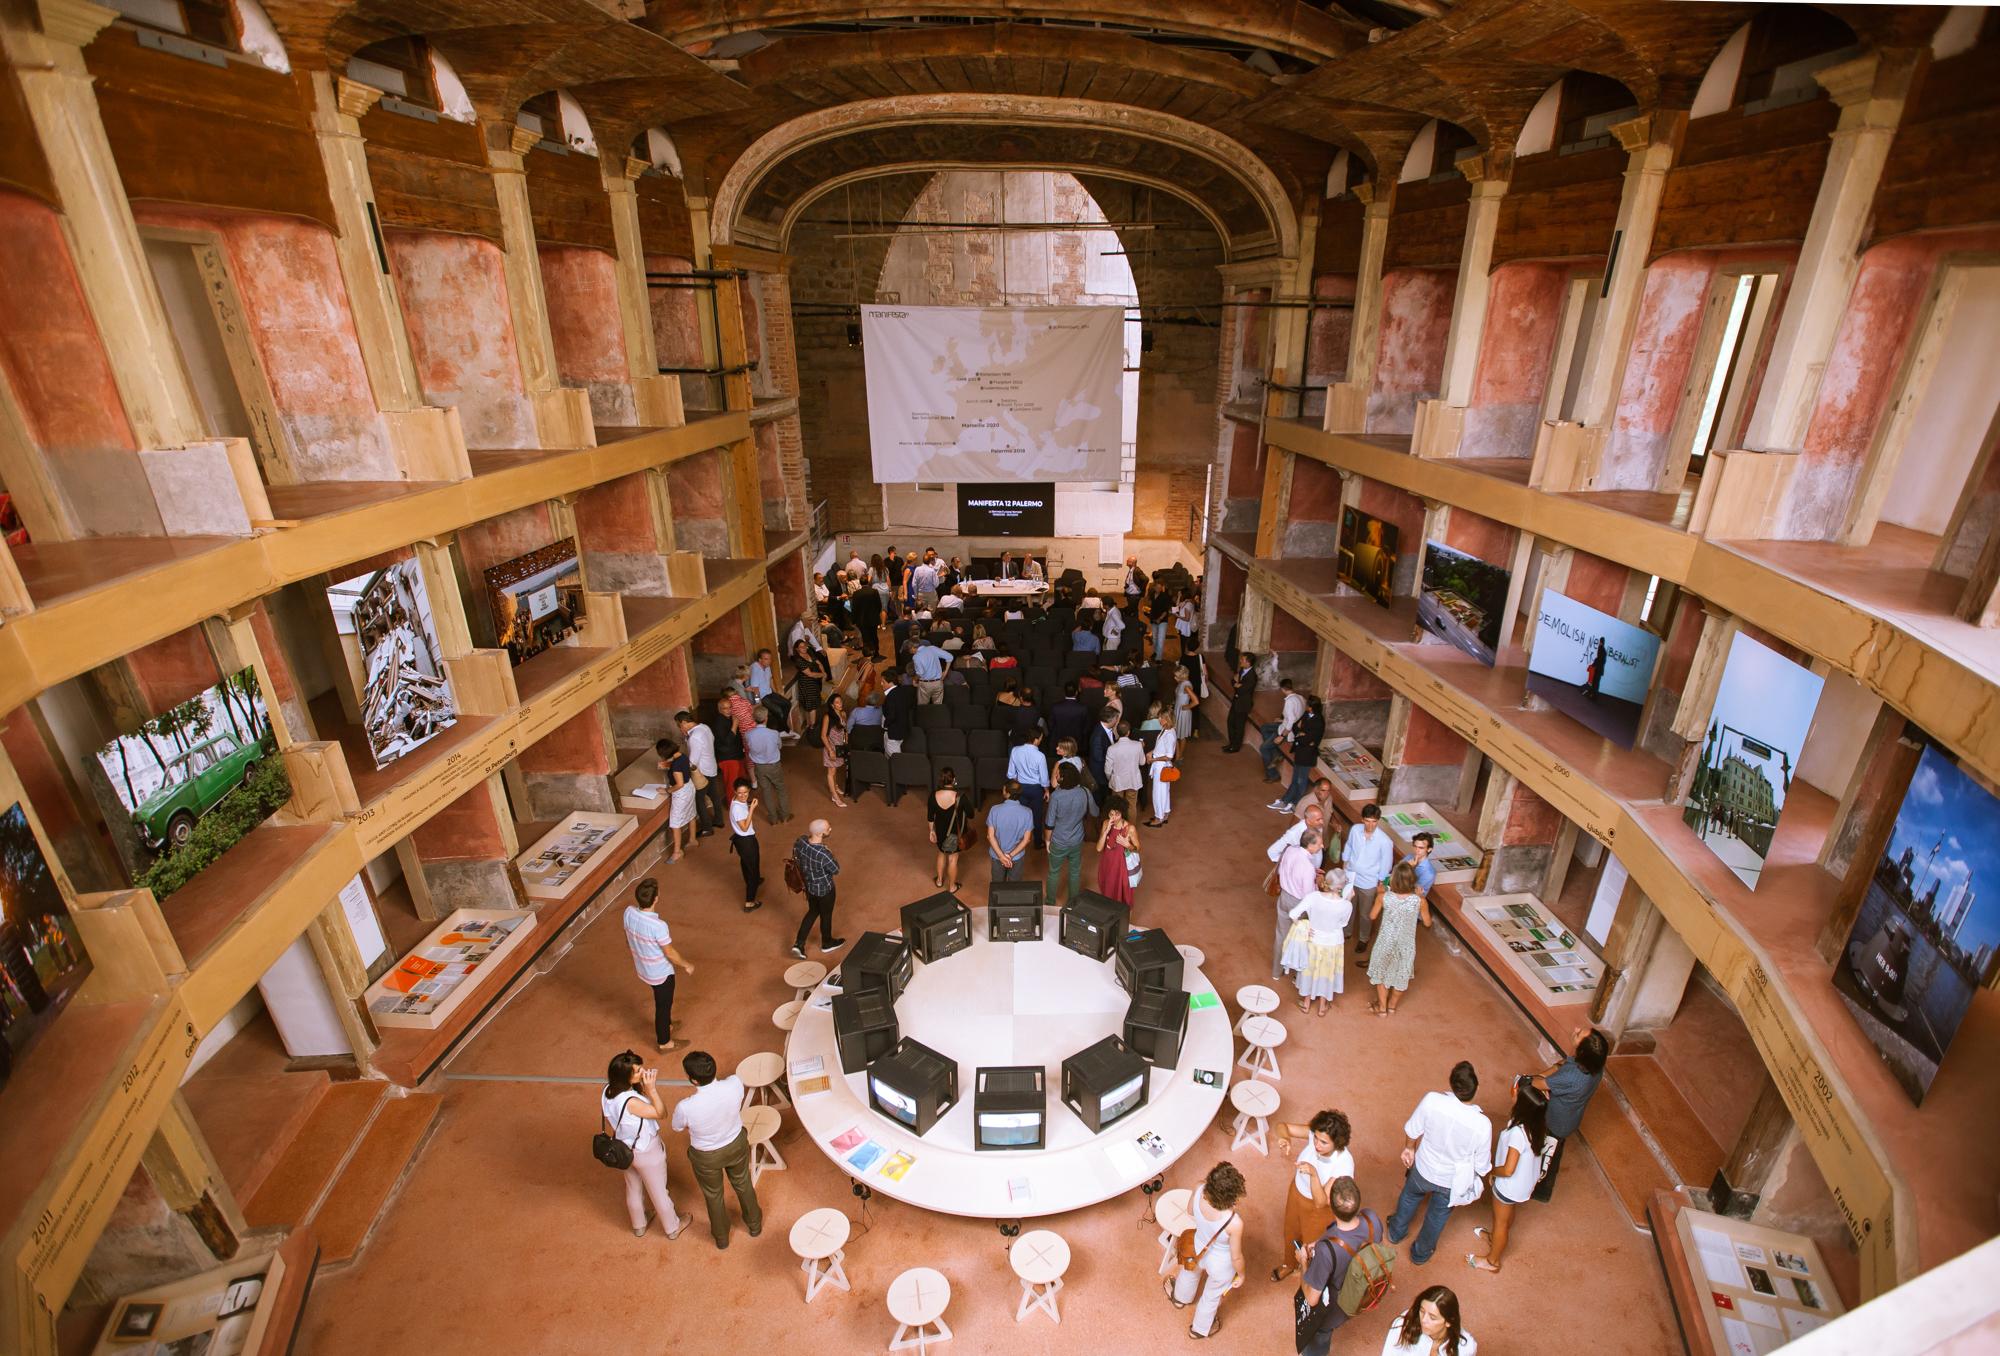 Teatro Garibaldi, photo by Cave Studio